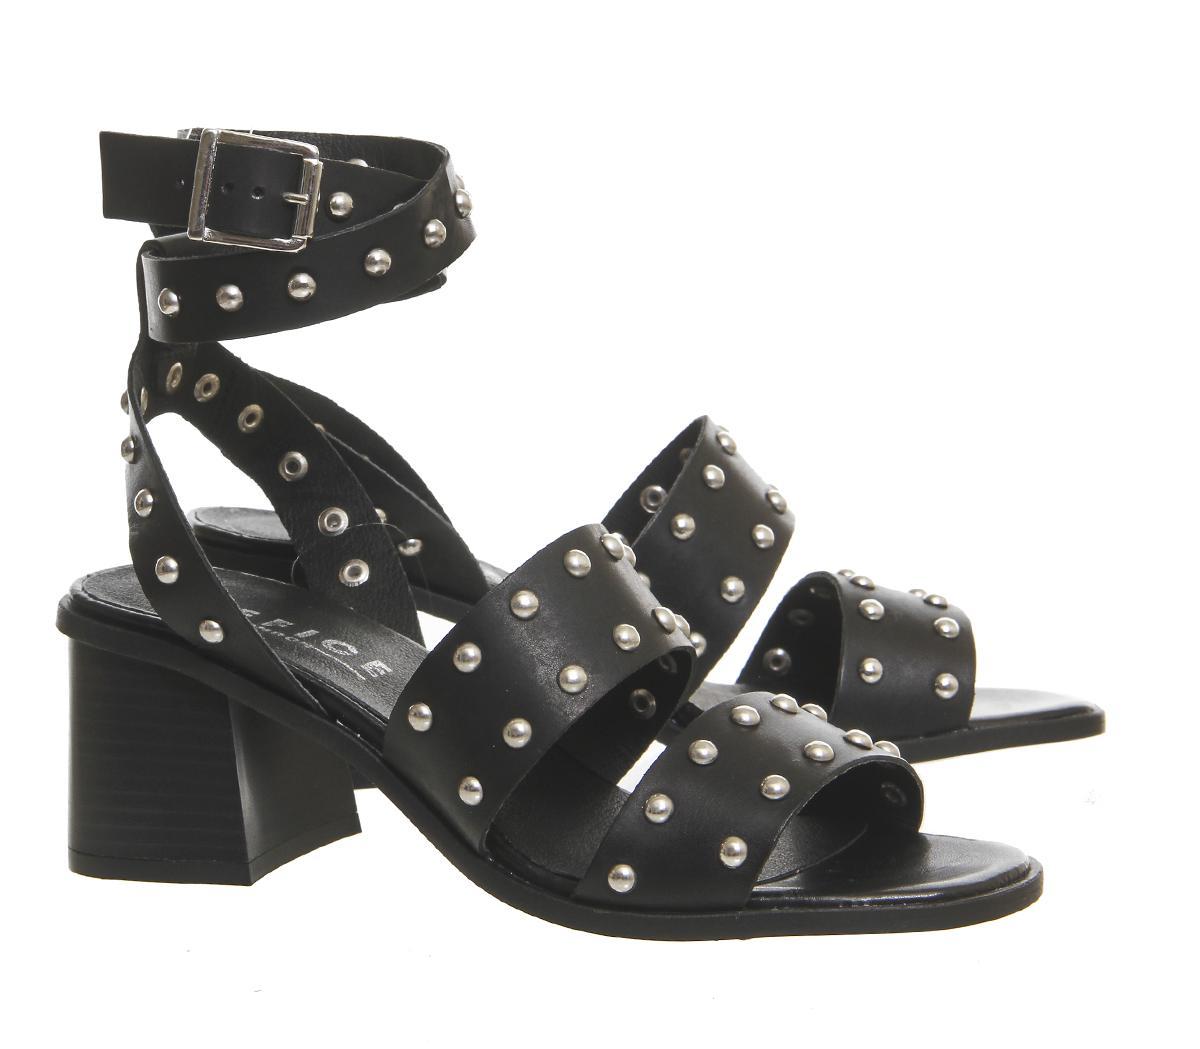 8d5175a973a Lyst - Office Fan Girl Studded Sandals in Black